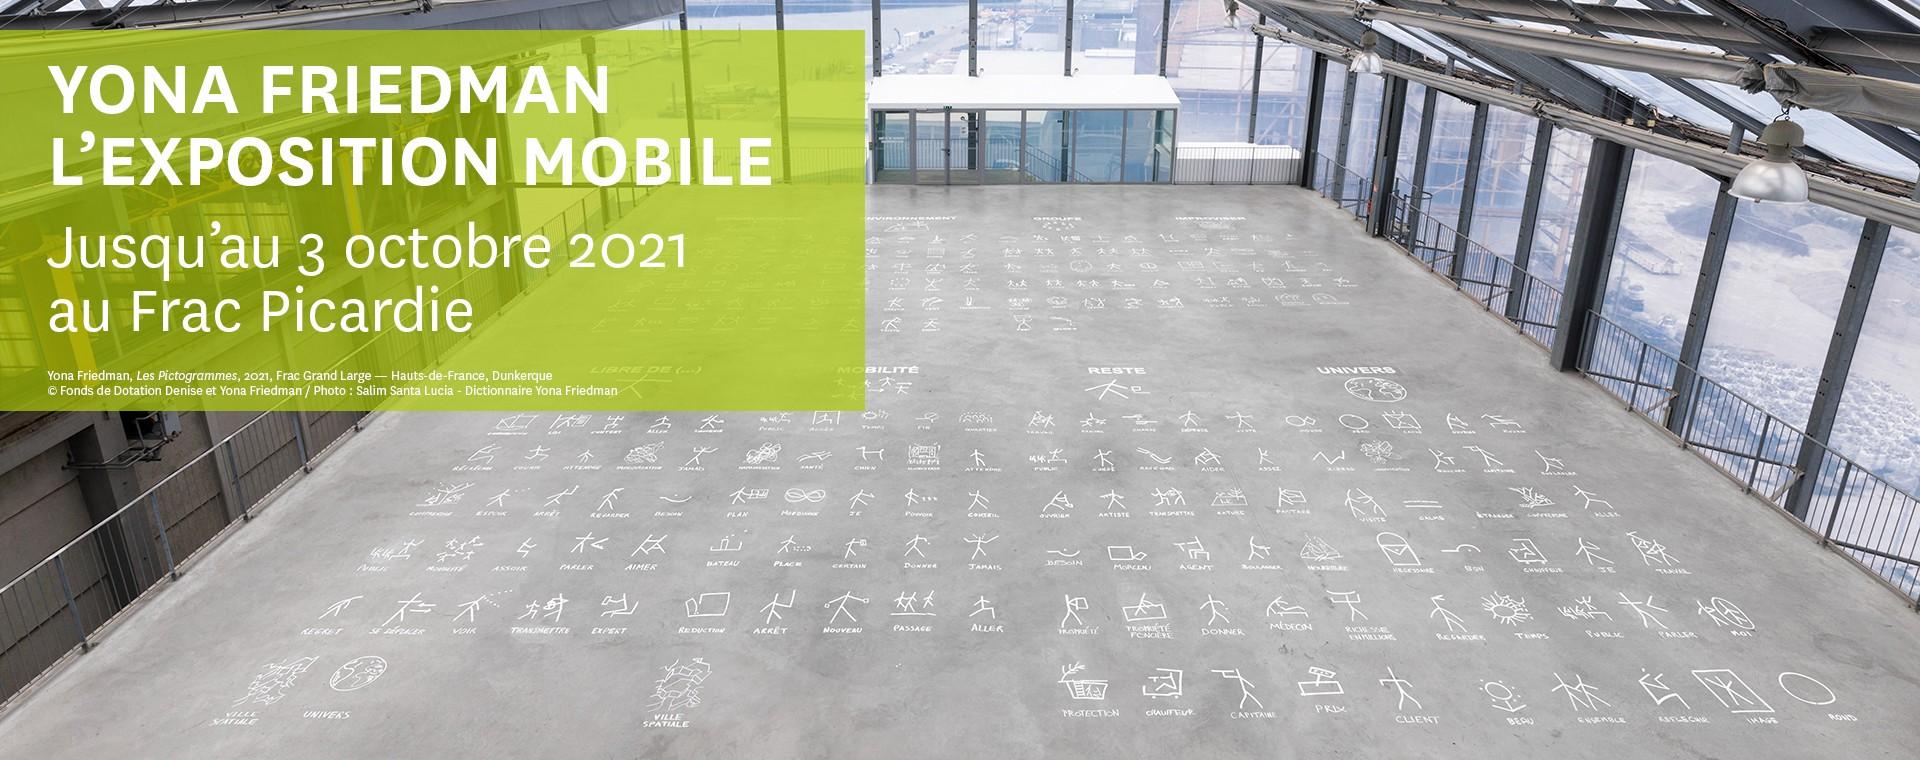 Yona Friedman, l'exposition mobile